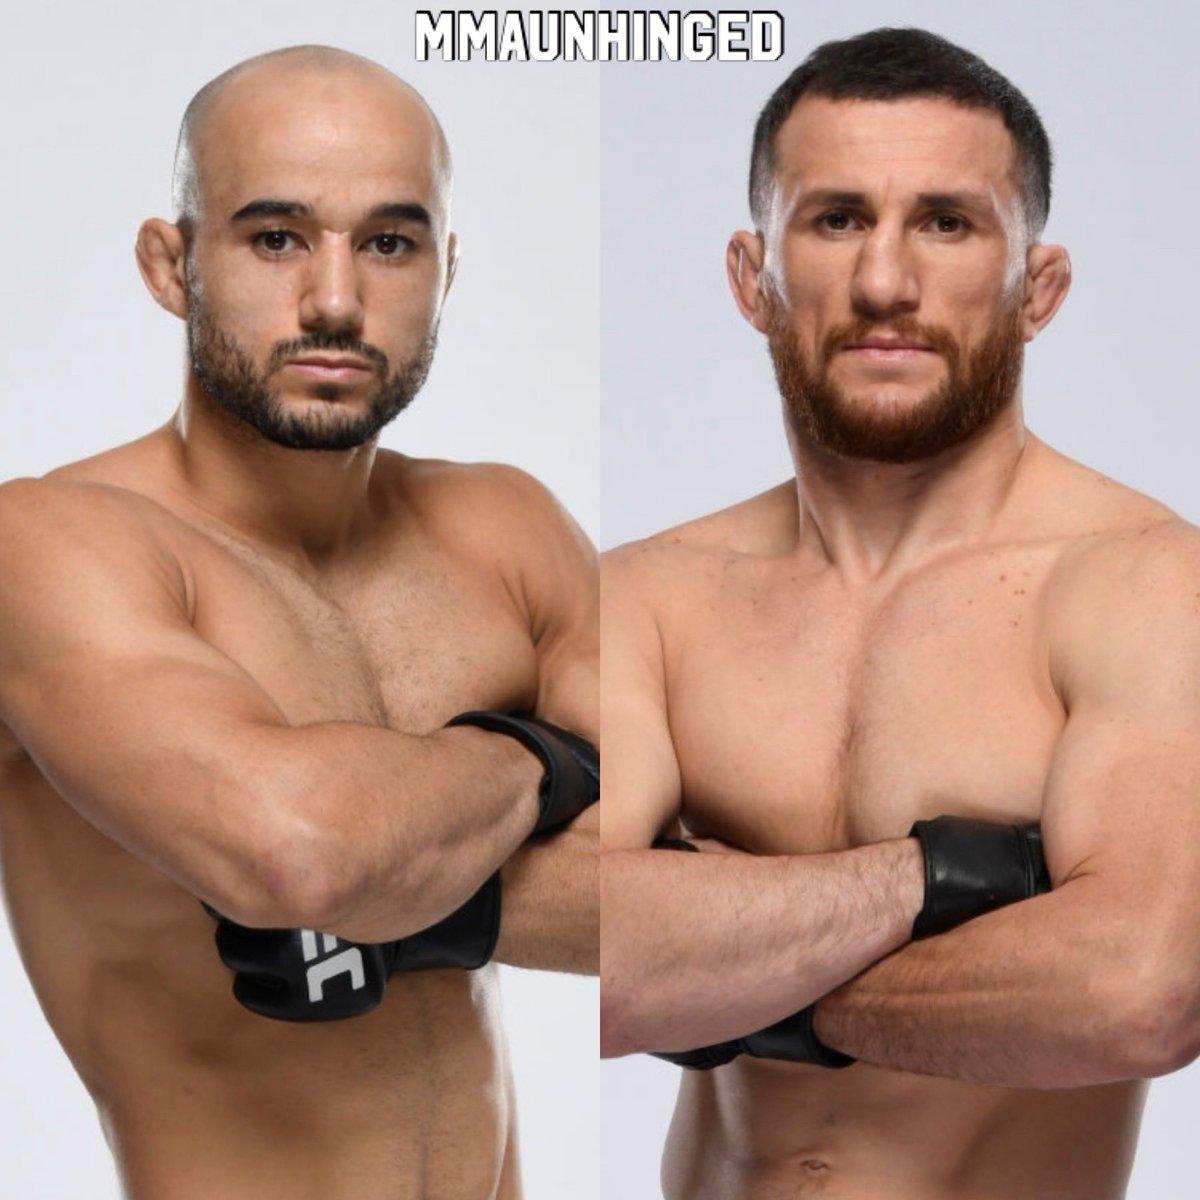 Marlon Moraes vs Merab Dvalishvili added to #UFC266 on September 25 - (135lbs) per @anikflorianpod  #UFC #MarlonMoraes #MerabDvalishvili #MMATwitter https://t.co/oMznWpLK8z